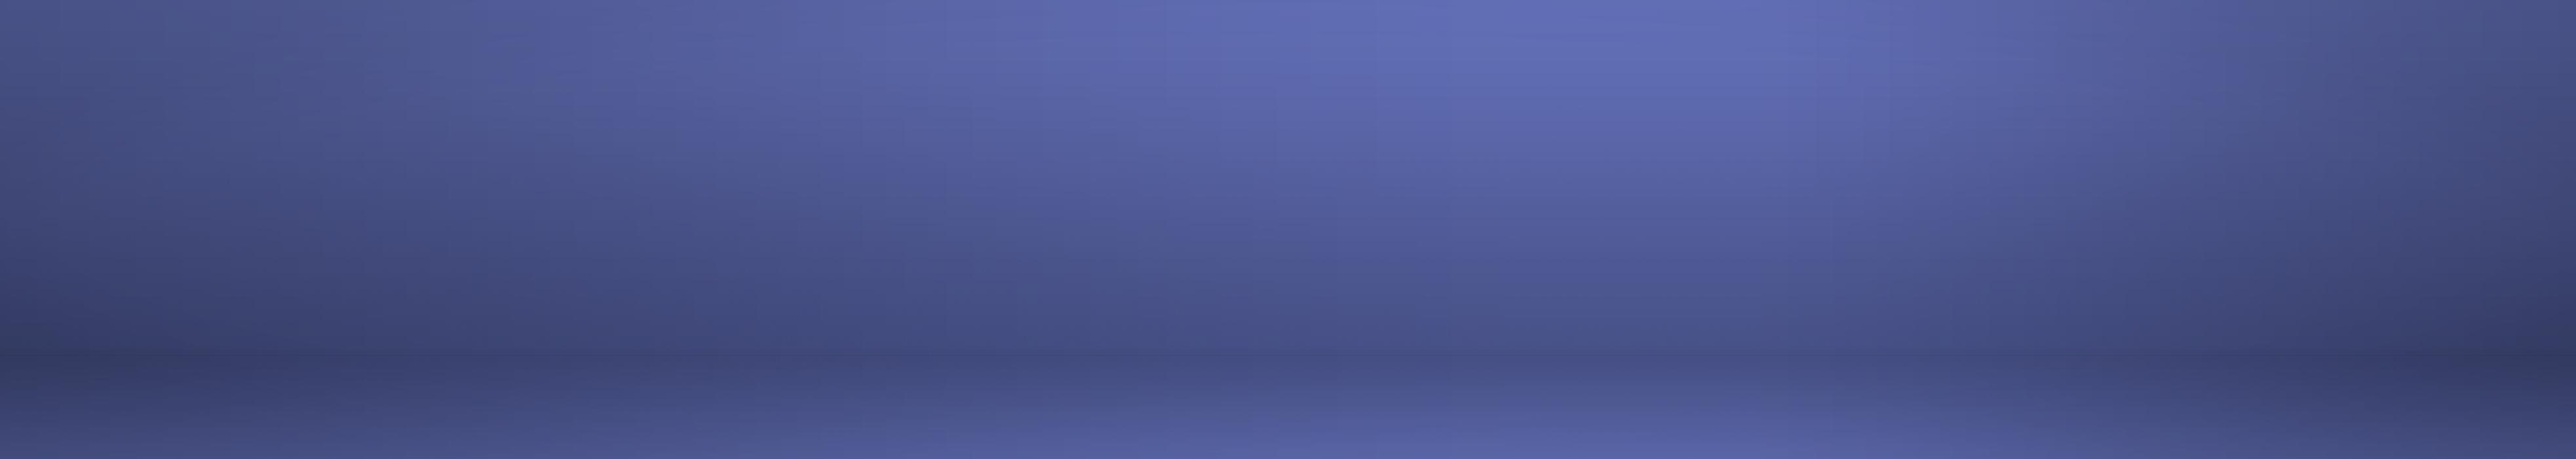 fondo-azul1